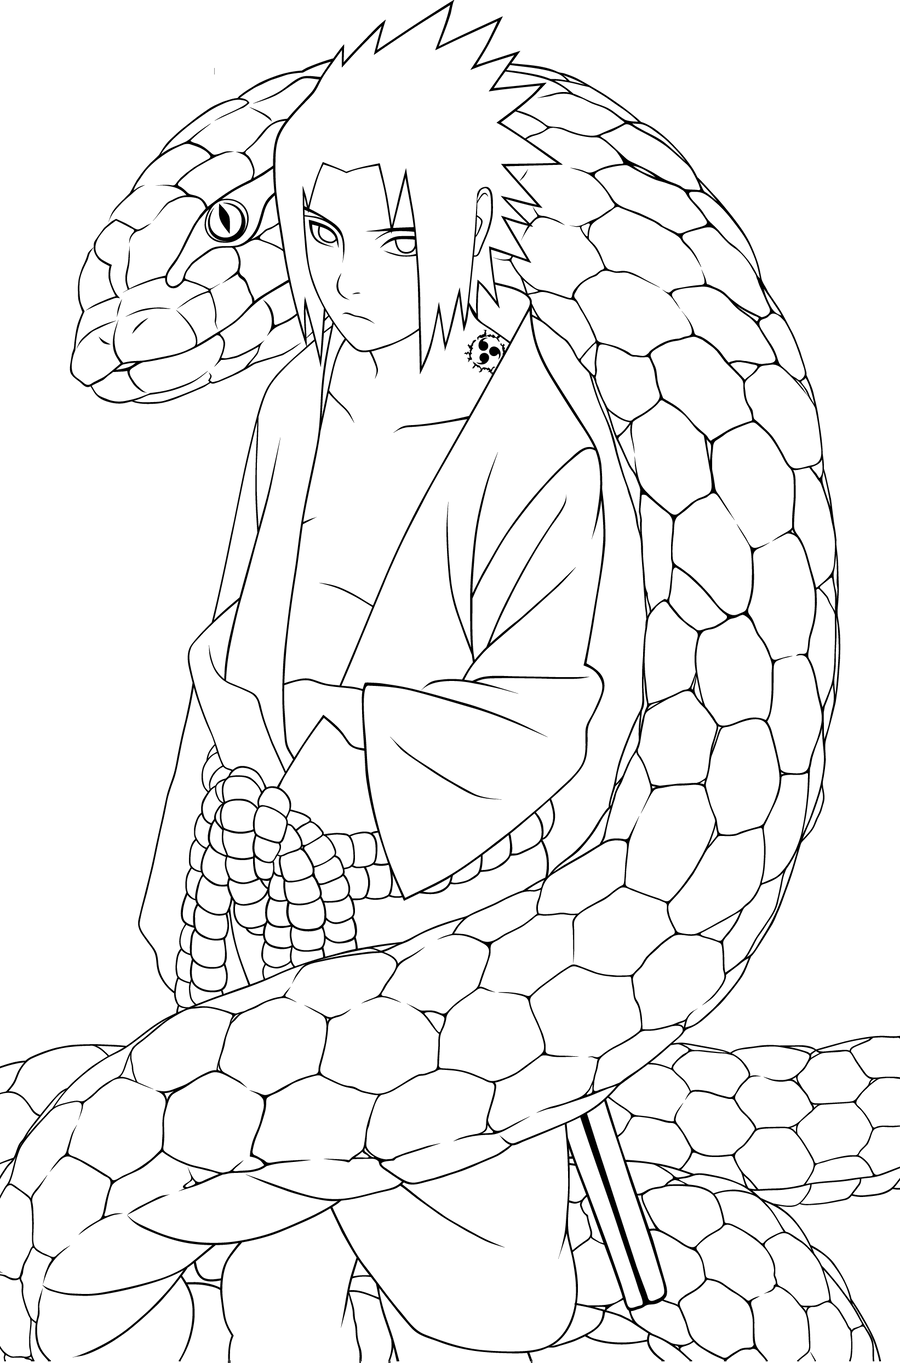 Sasuke Lineart : Uchiha sasuke lineart by skurpix on deviantart